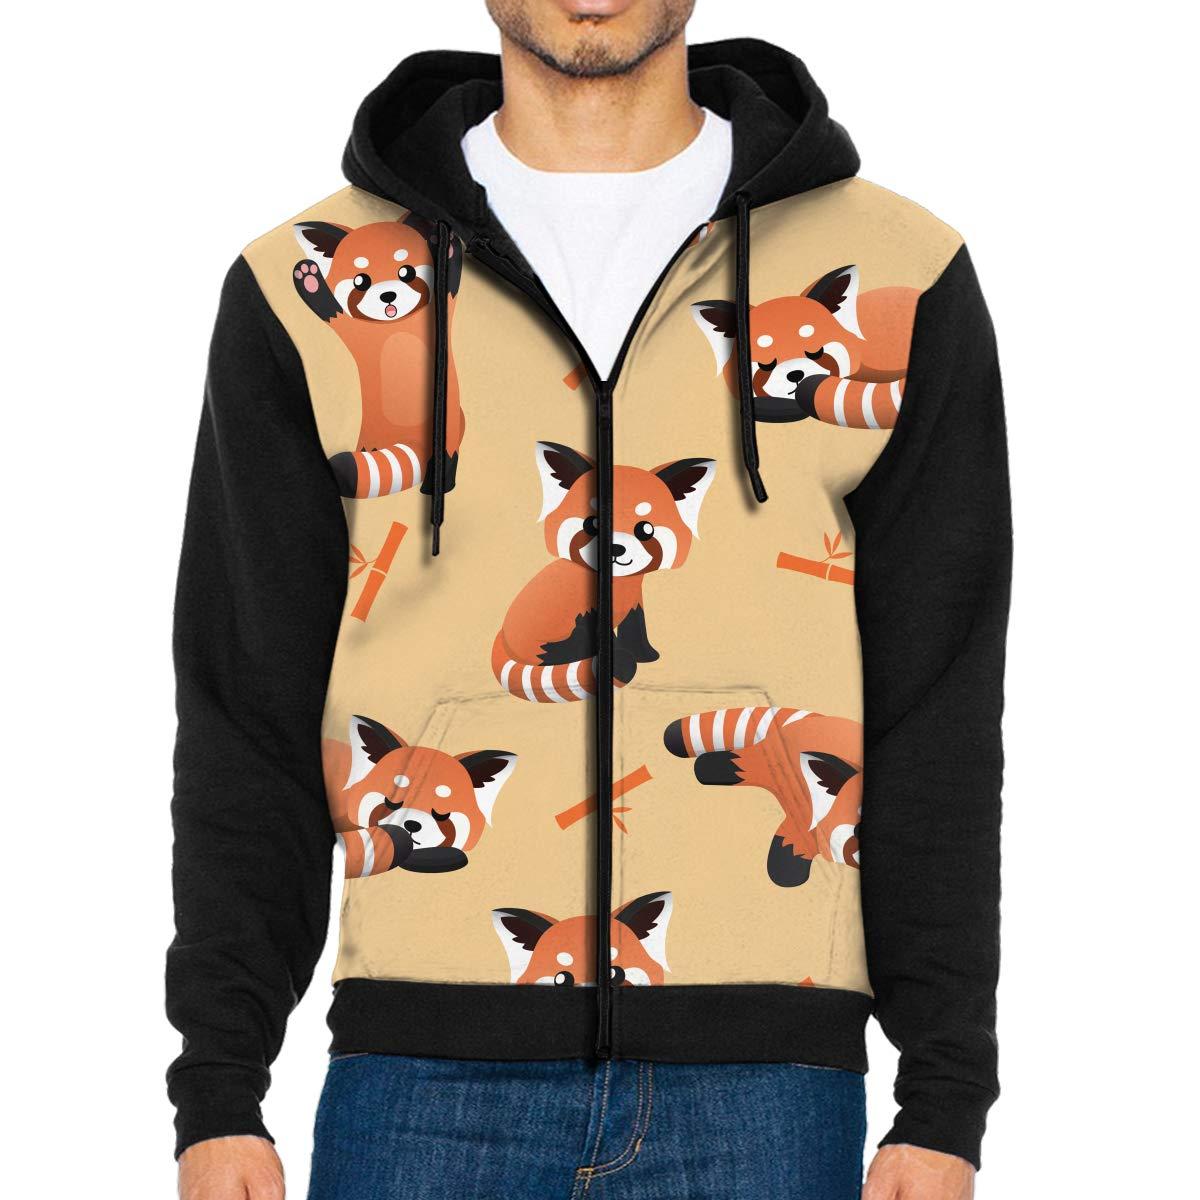 Mens Pullover Hood Cute Red Panda Zip Hoodies Hooded Fashion Jackets Coats